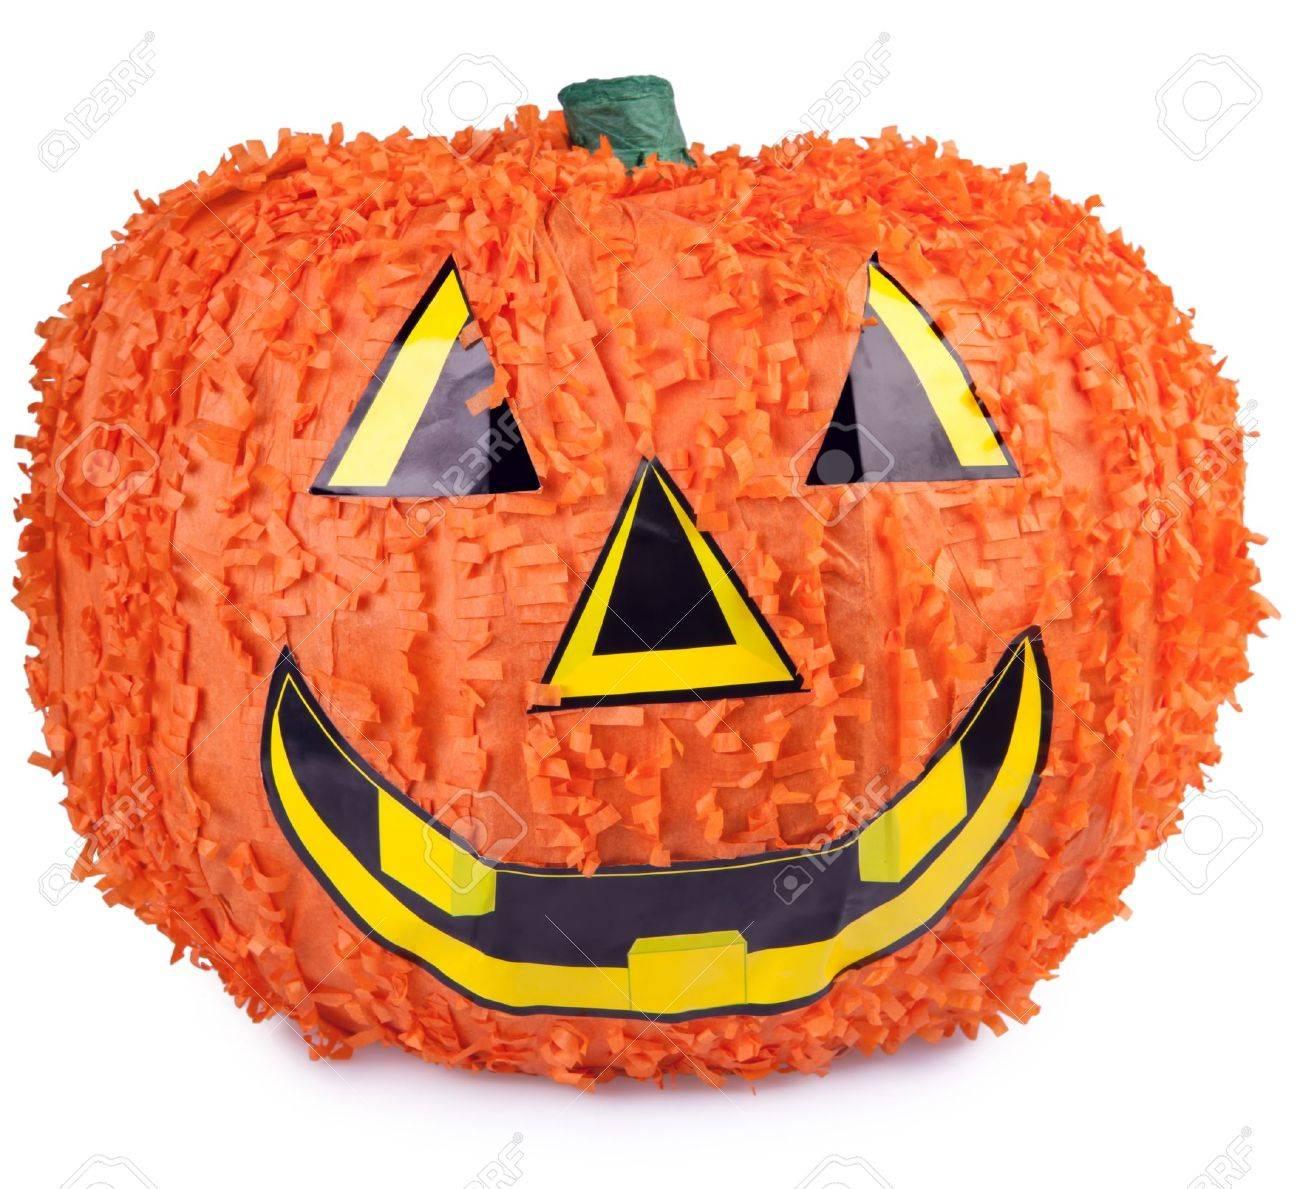 Calabaza De Halloween Hechas De Papel Mache Fotos Retratos - Calabaza-de-papel